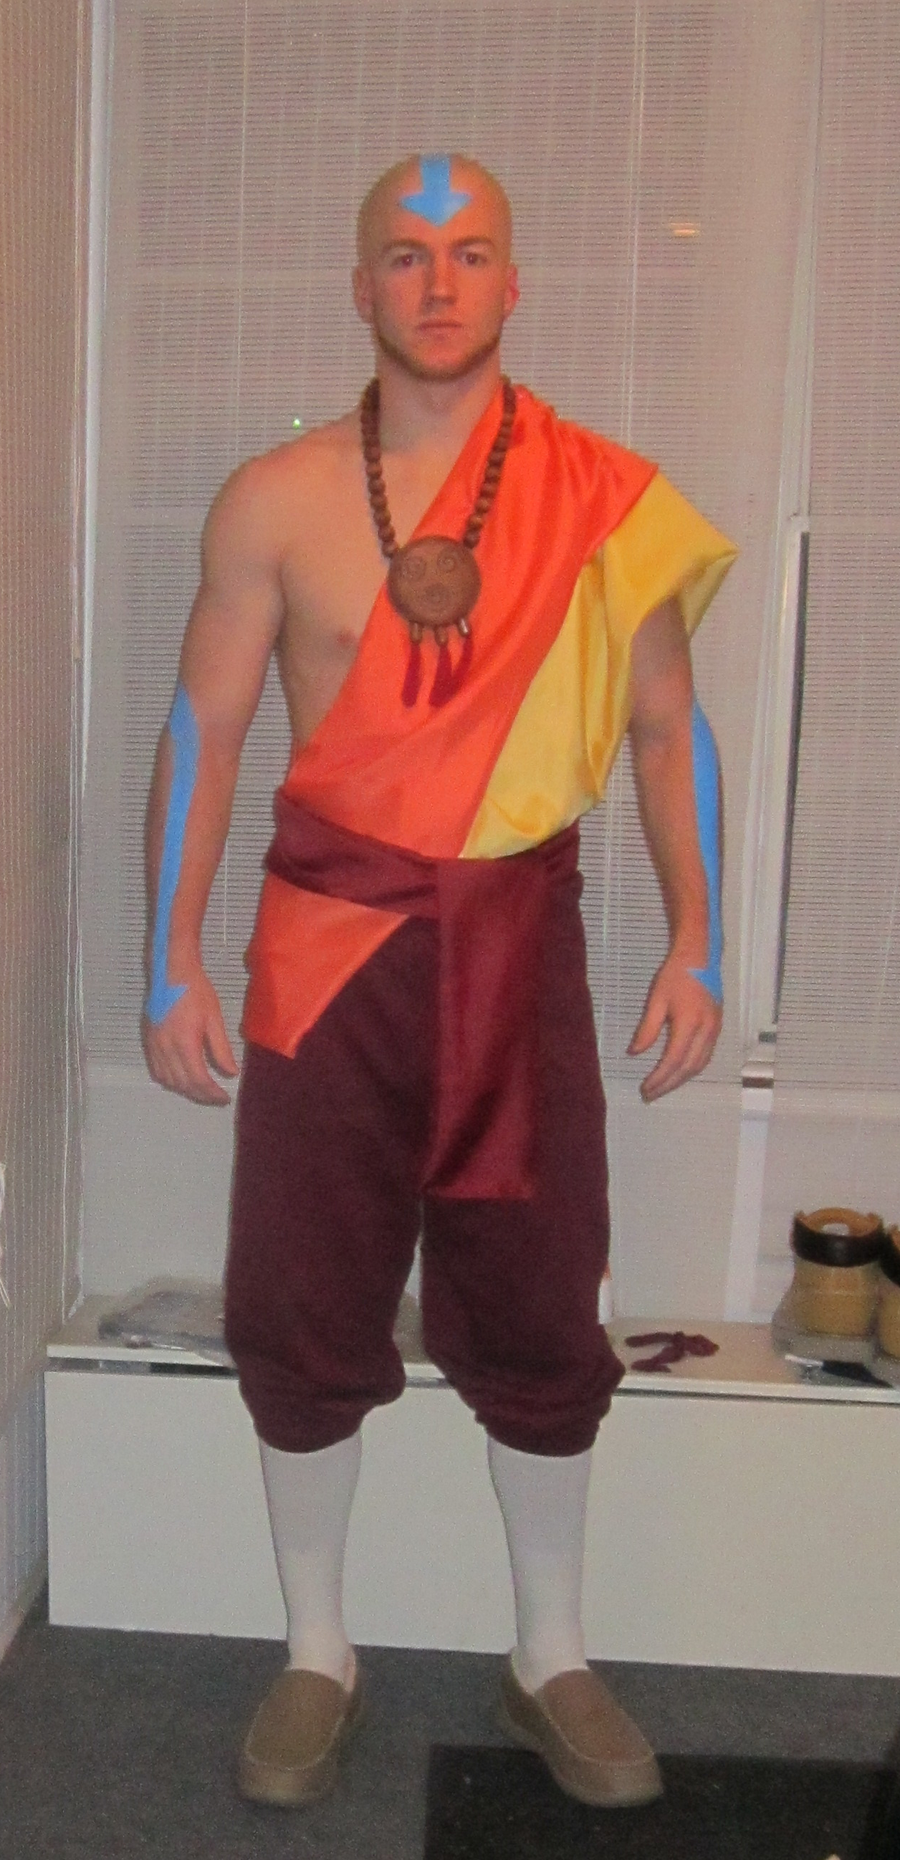 Adult Aang Halloween costume by Mariowned on DeviantArt: mariowned.deviantart.com/art/Adult-Aang-Halloween-costume-334863583